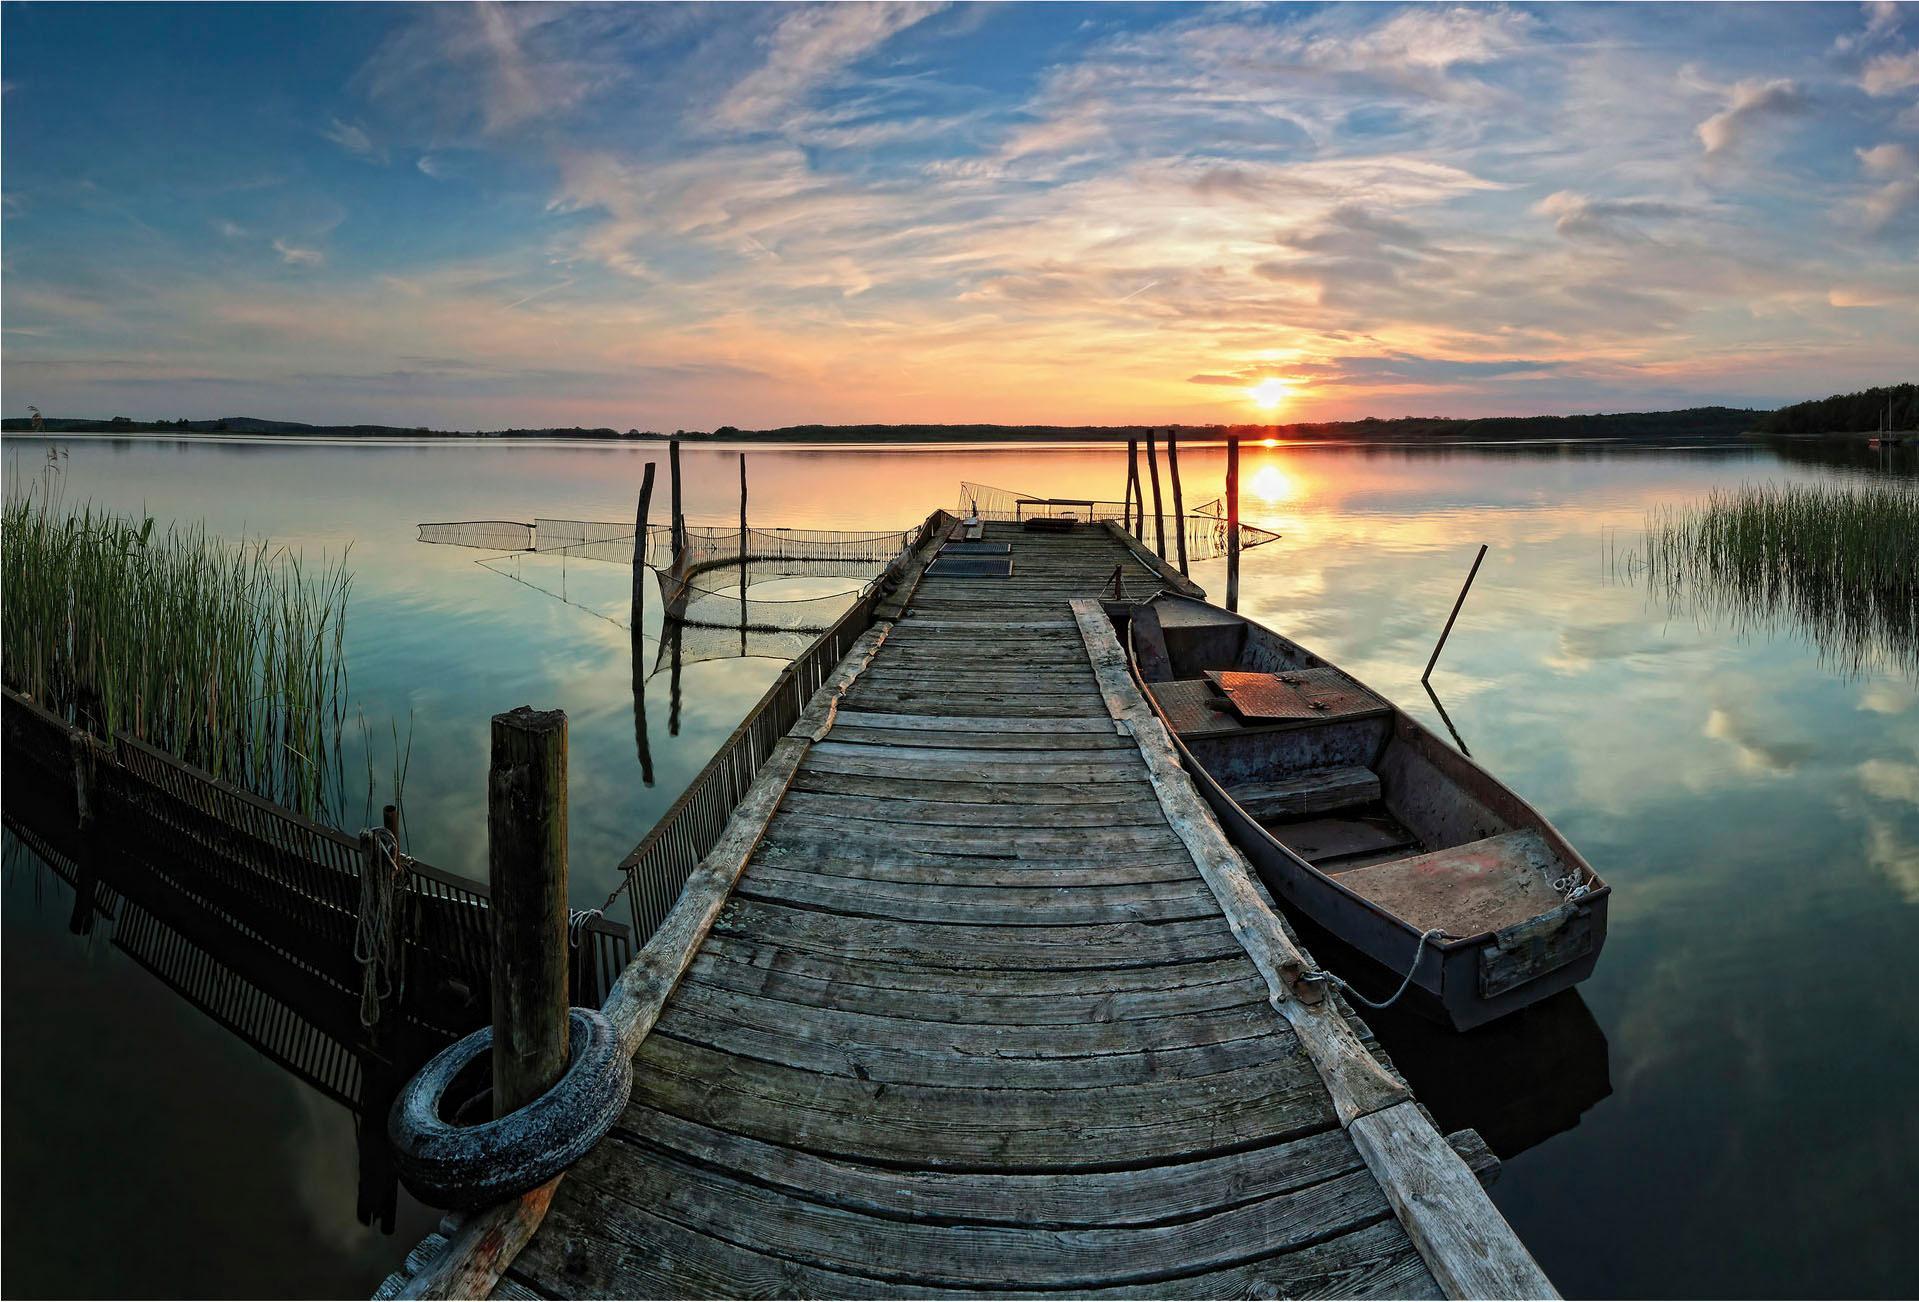 Vliestapete Sunset at the lake bunt Fototapeten Tapeten Bauen Renovieren